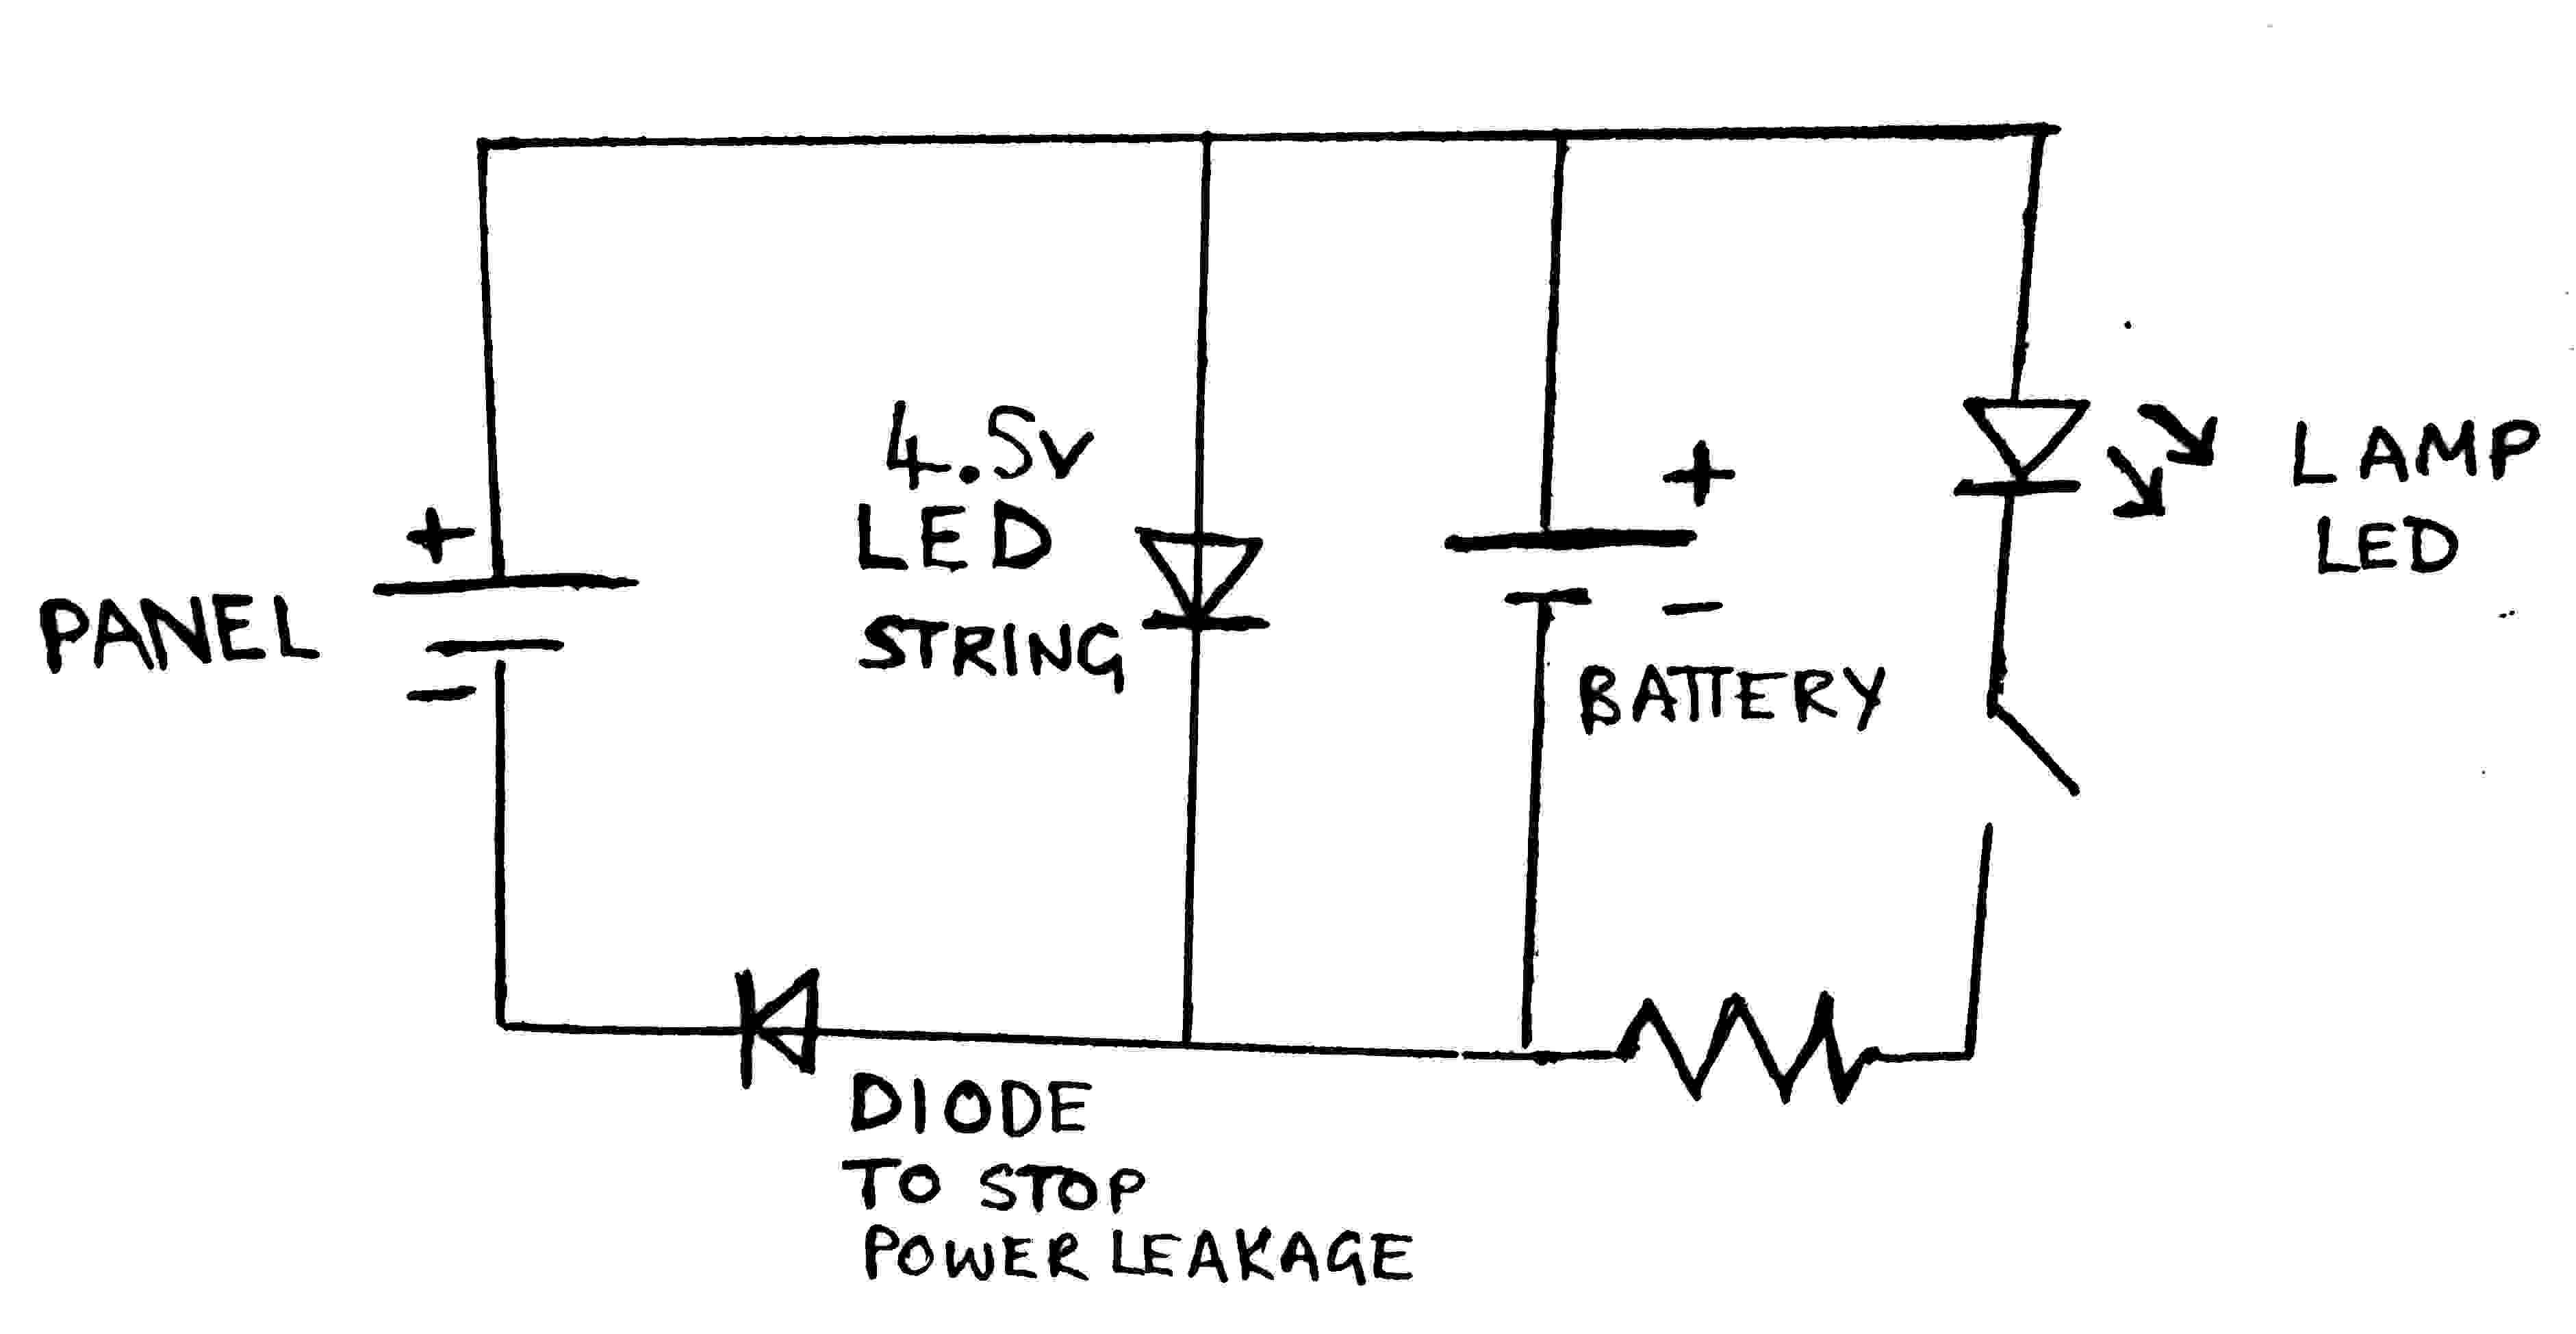 Solar Light Wiring Diagram solar Wiring Diagram Rate tower Ac Wiring Diagram Fresh Http Of Solar Light Wiring Diagram